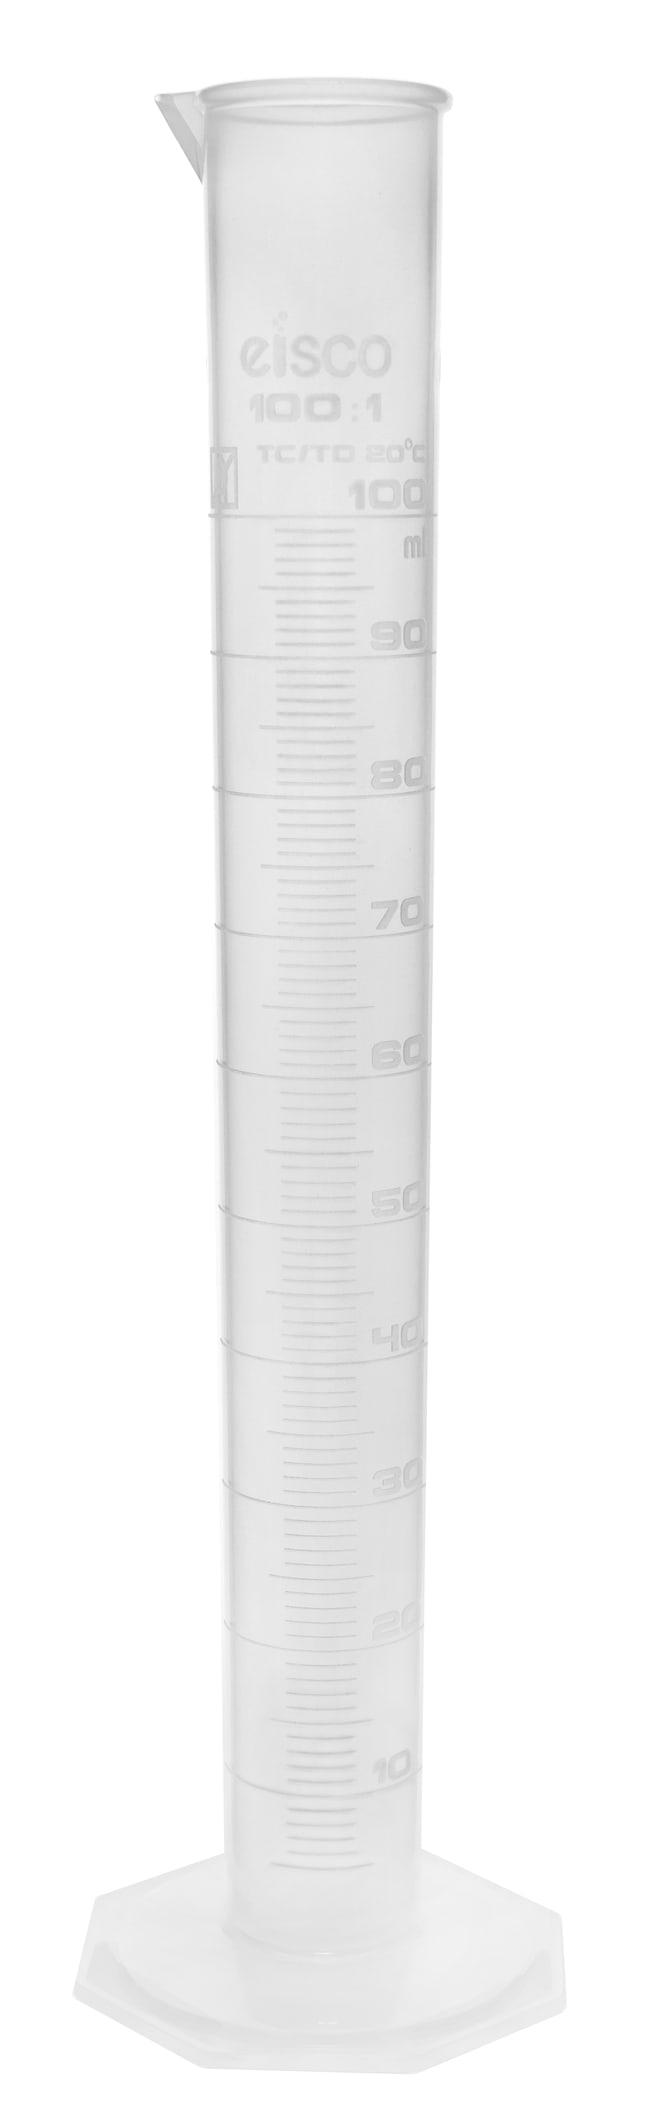 Eisco™Polypropylene Cylinders